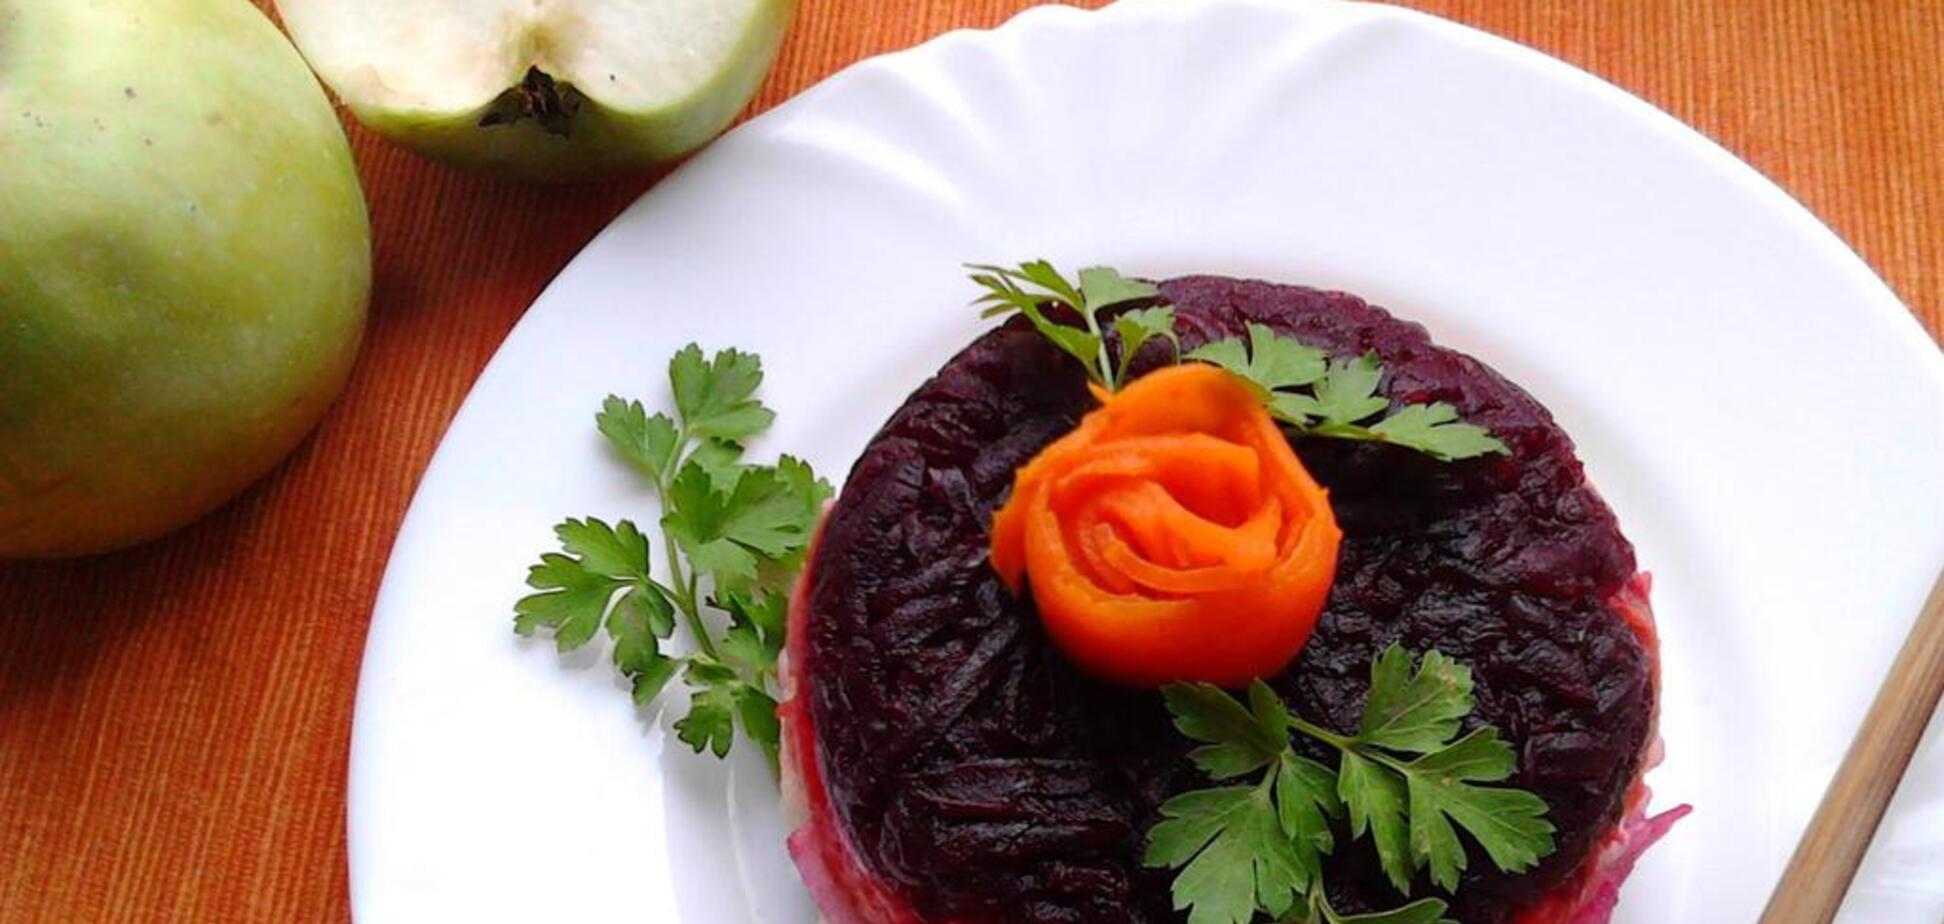 Святкове меню: рецепт найсмачнішого салату 'Шуба'